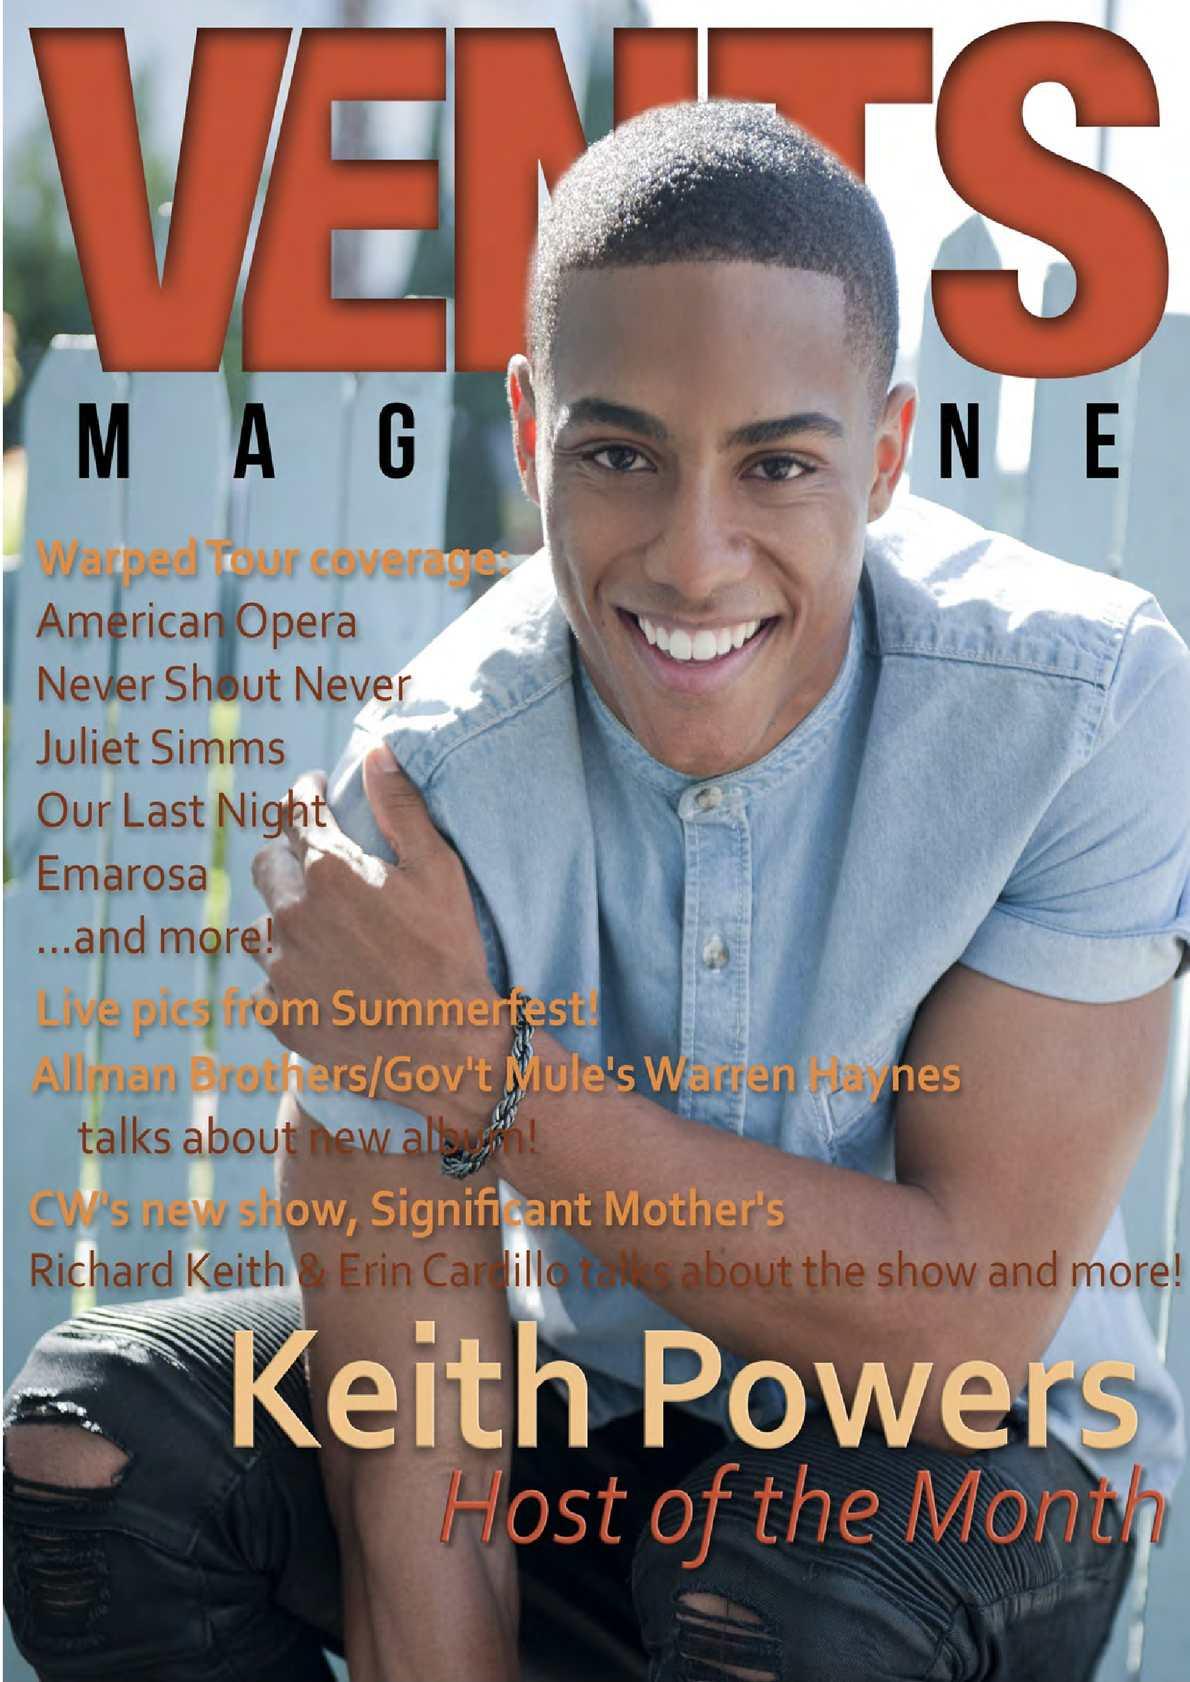 Calaméo VENTS Magazine 49th issue